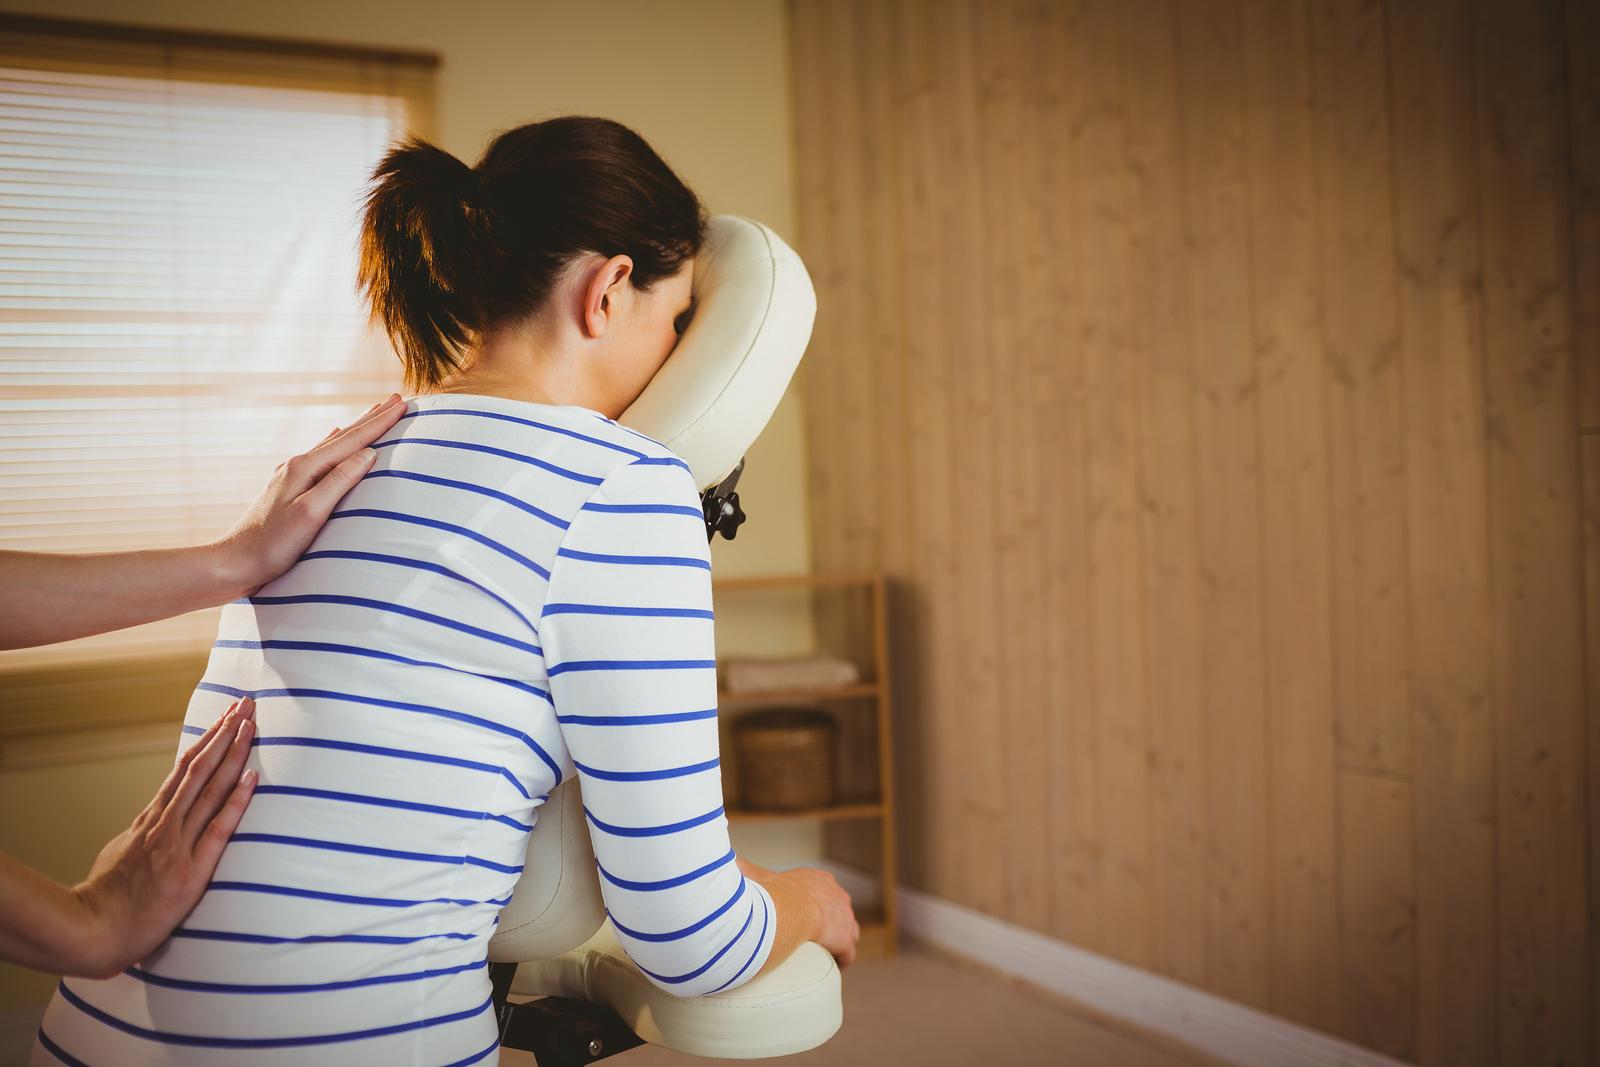 bigstock-Young-woman-getting-massage-in-99135968.jpg